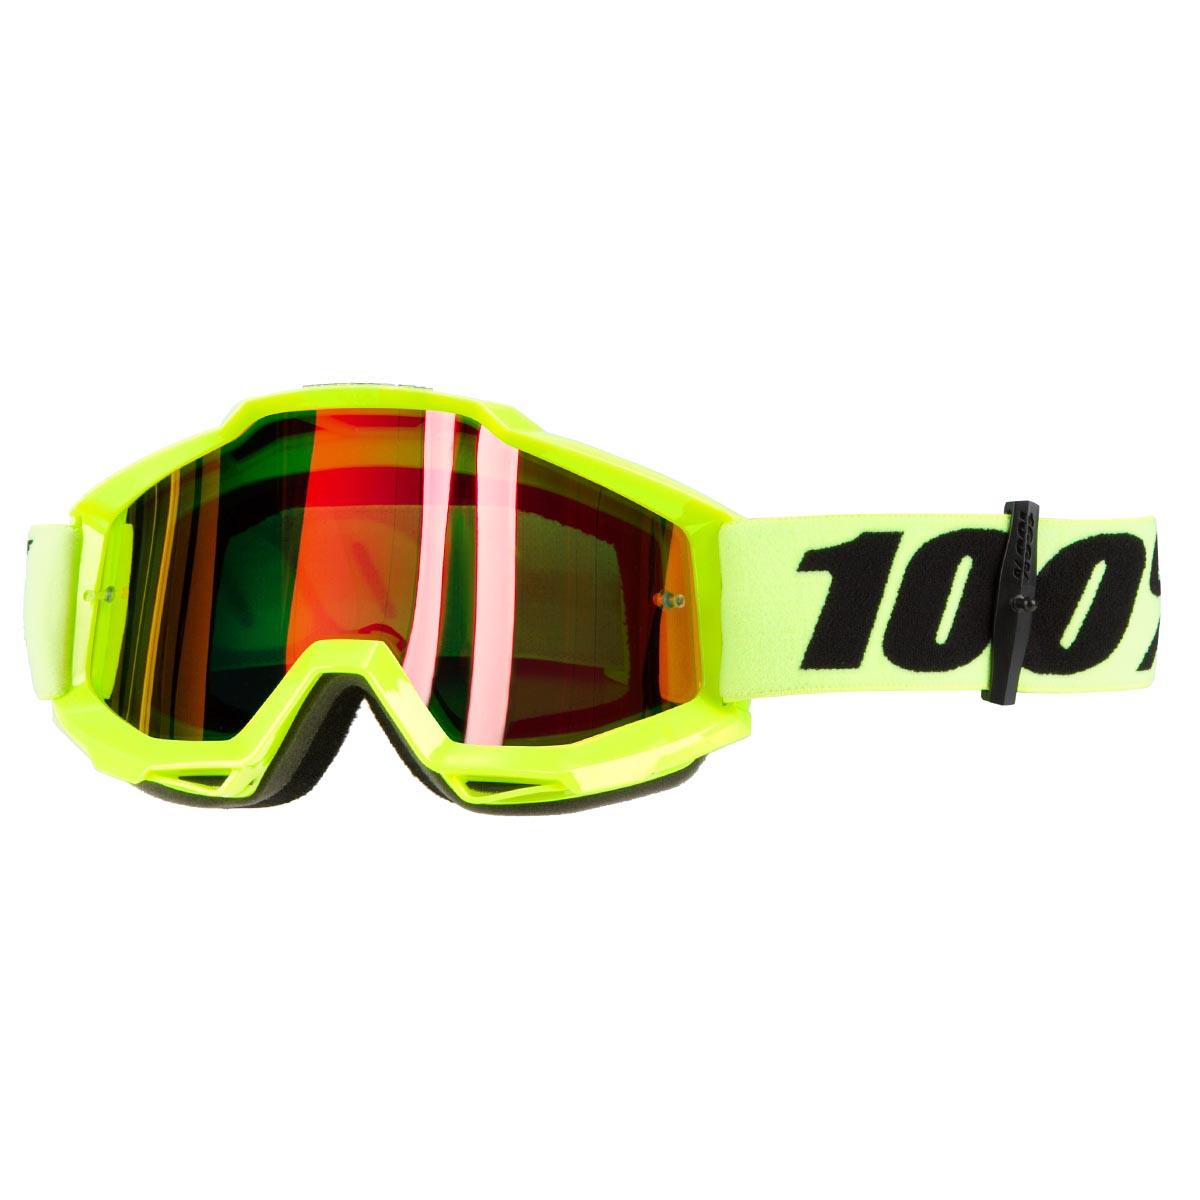 100% Crossbrille The Accuri Neongelb - Rot verspiegelt Anti-Fog